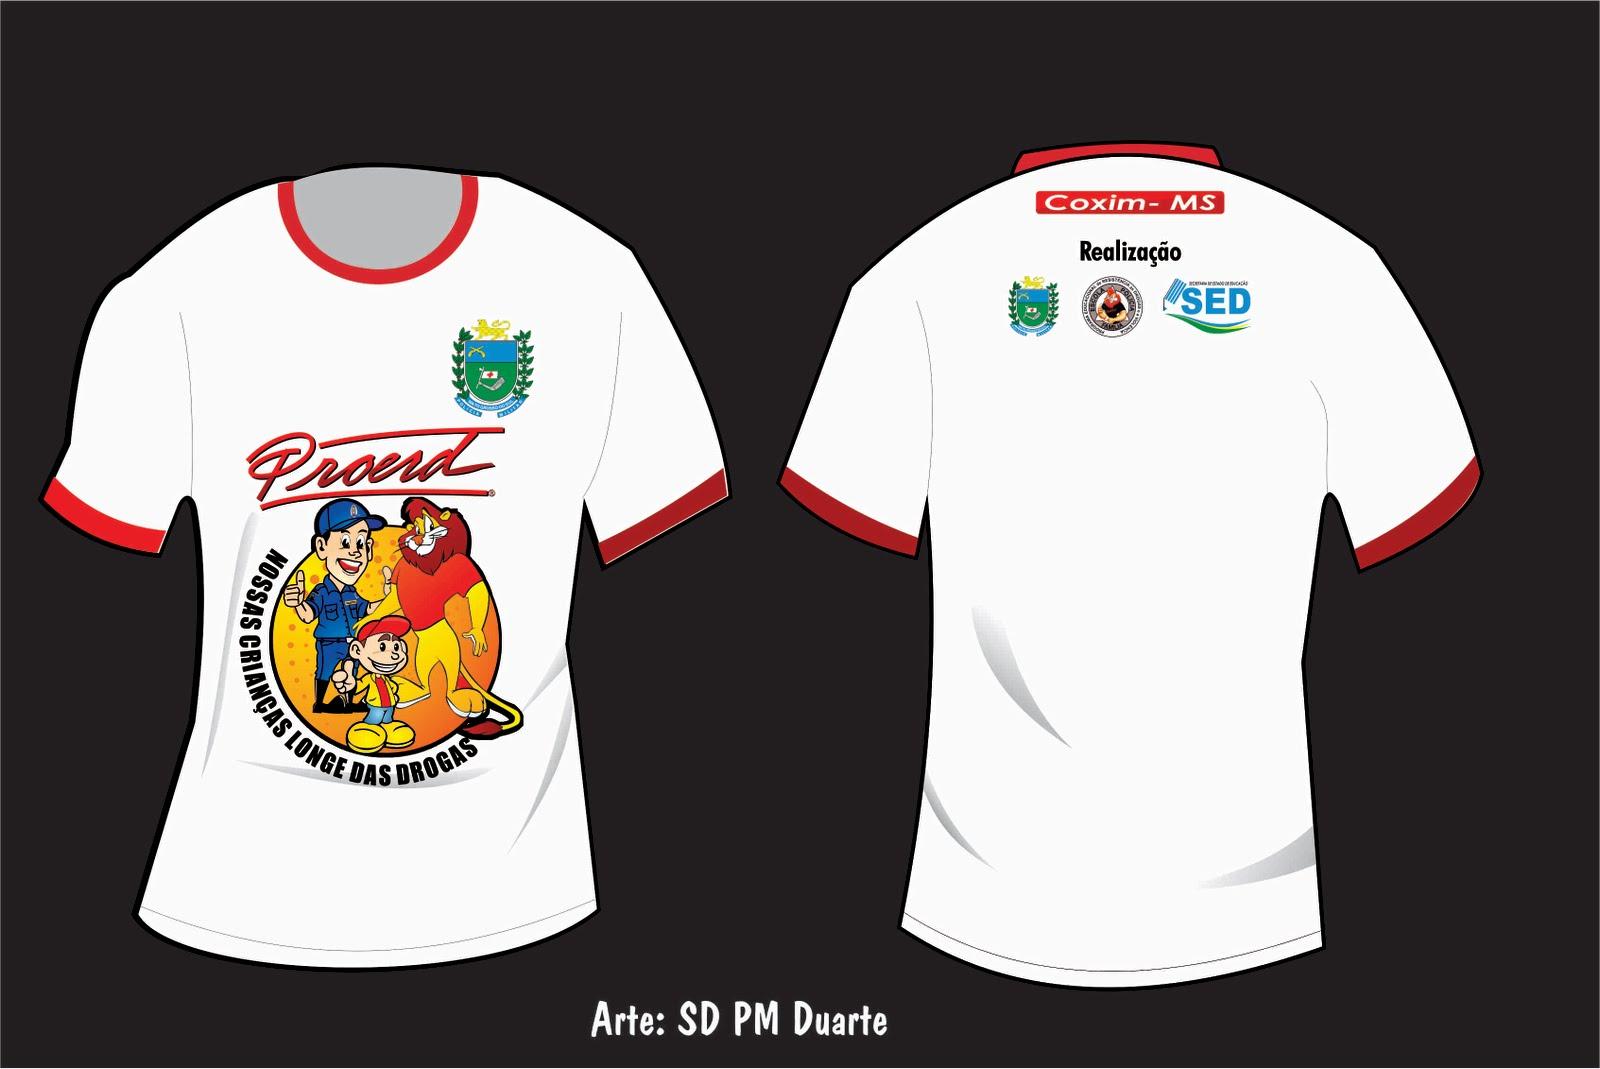 Camiseta Proerd 2011 Coxim